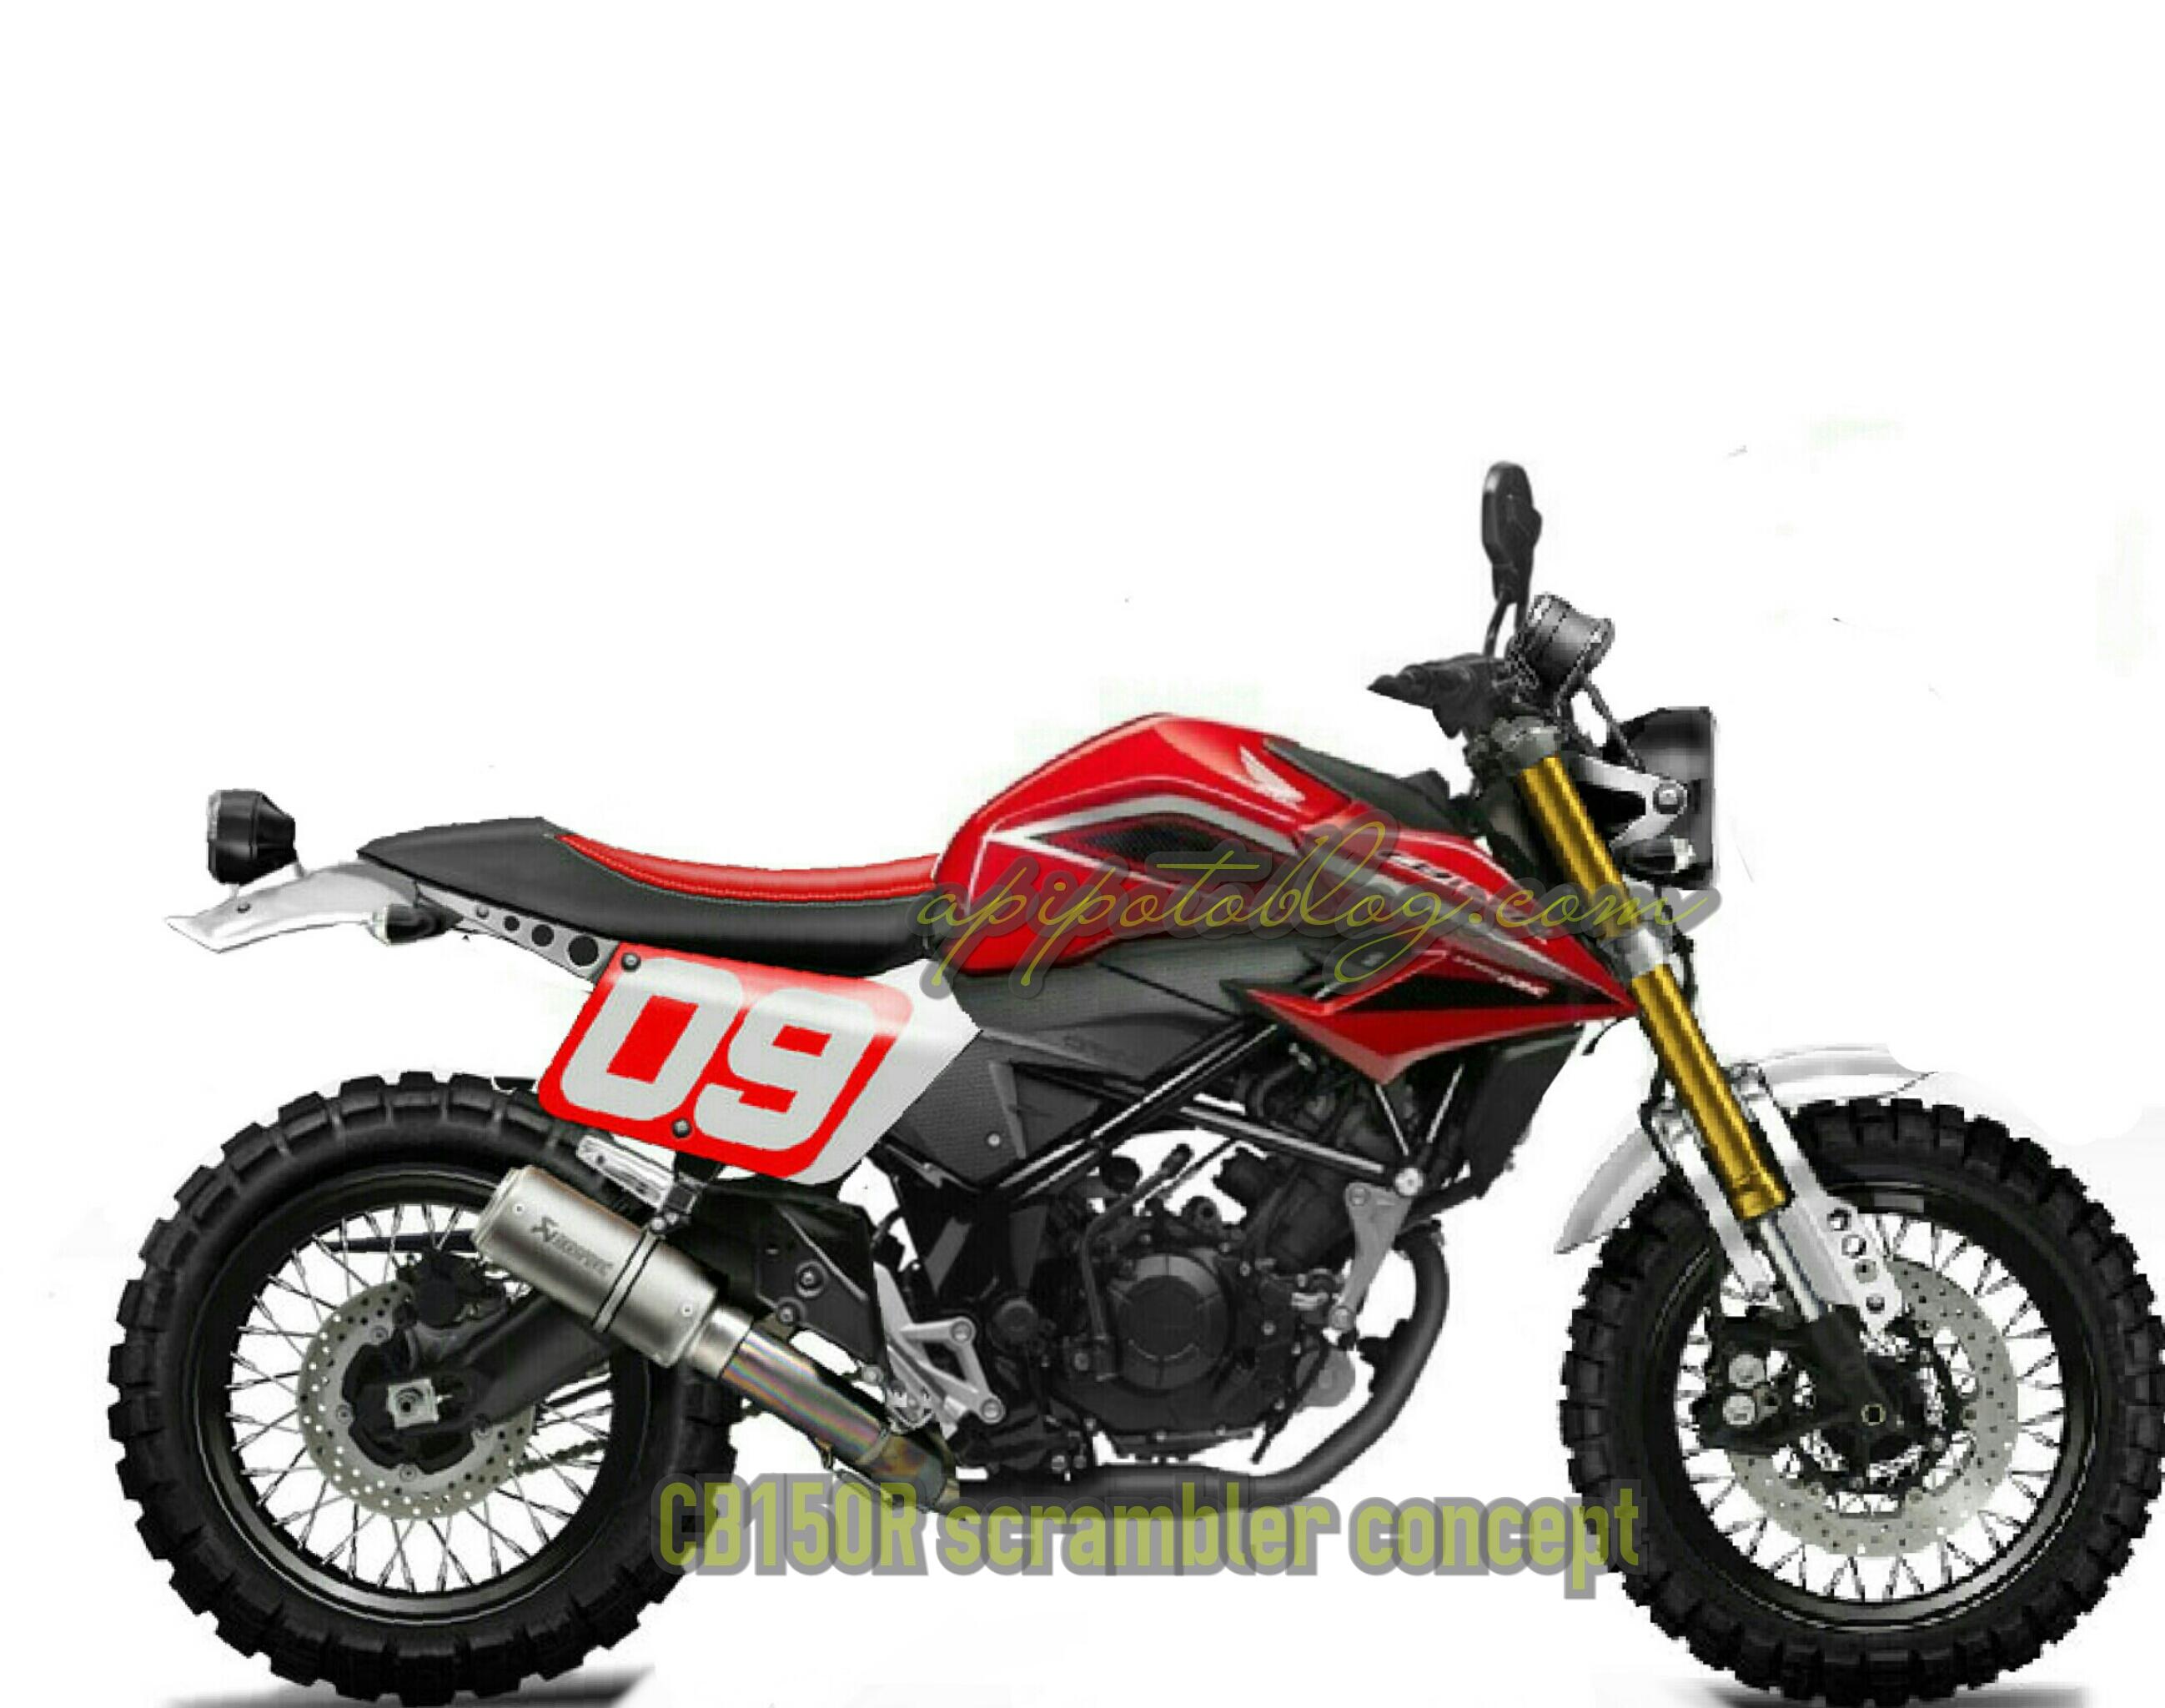 Modifikasi Motor Suzuki Jadul >> Honda All New CB150R Scrambler.. ? | Apipotoblog.com